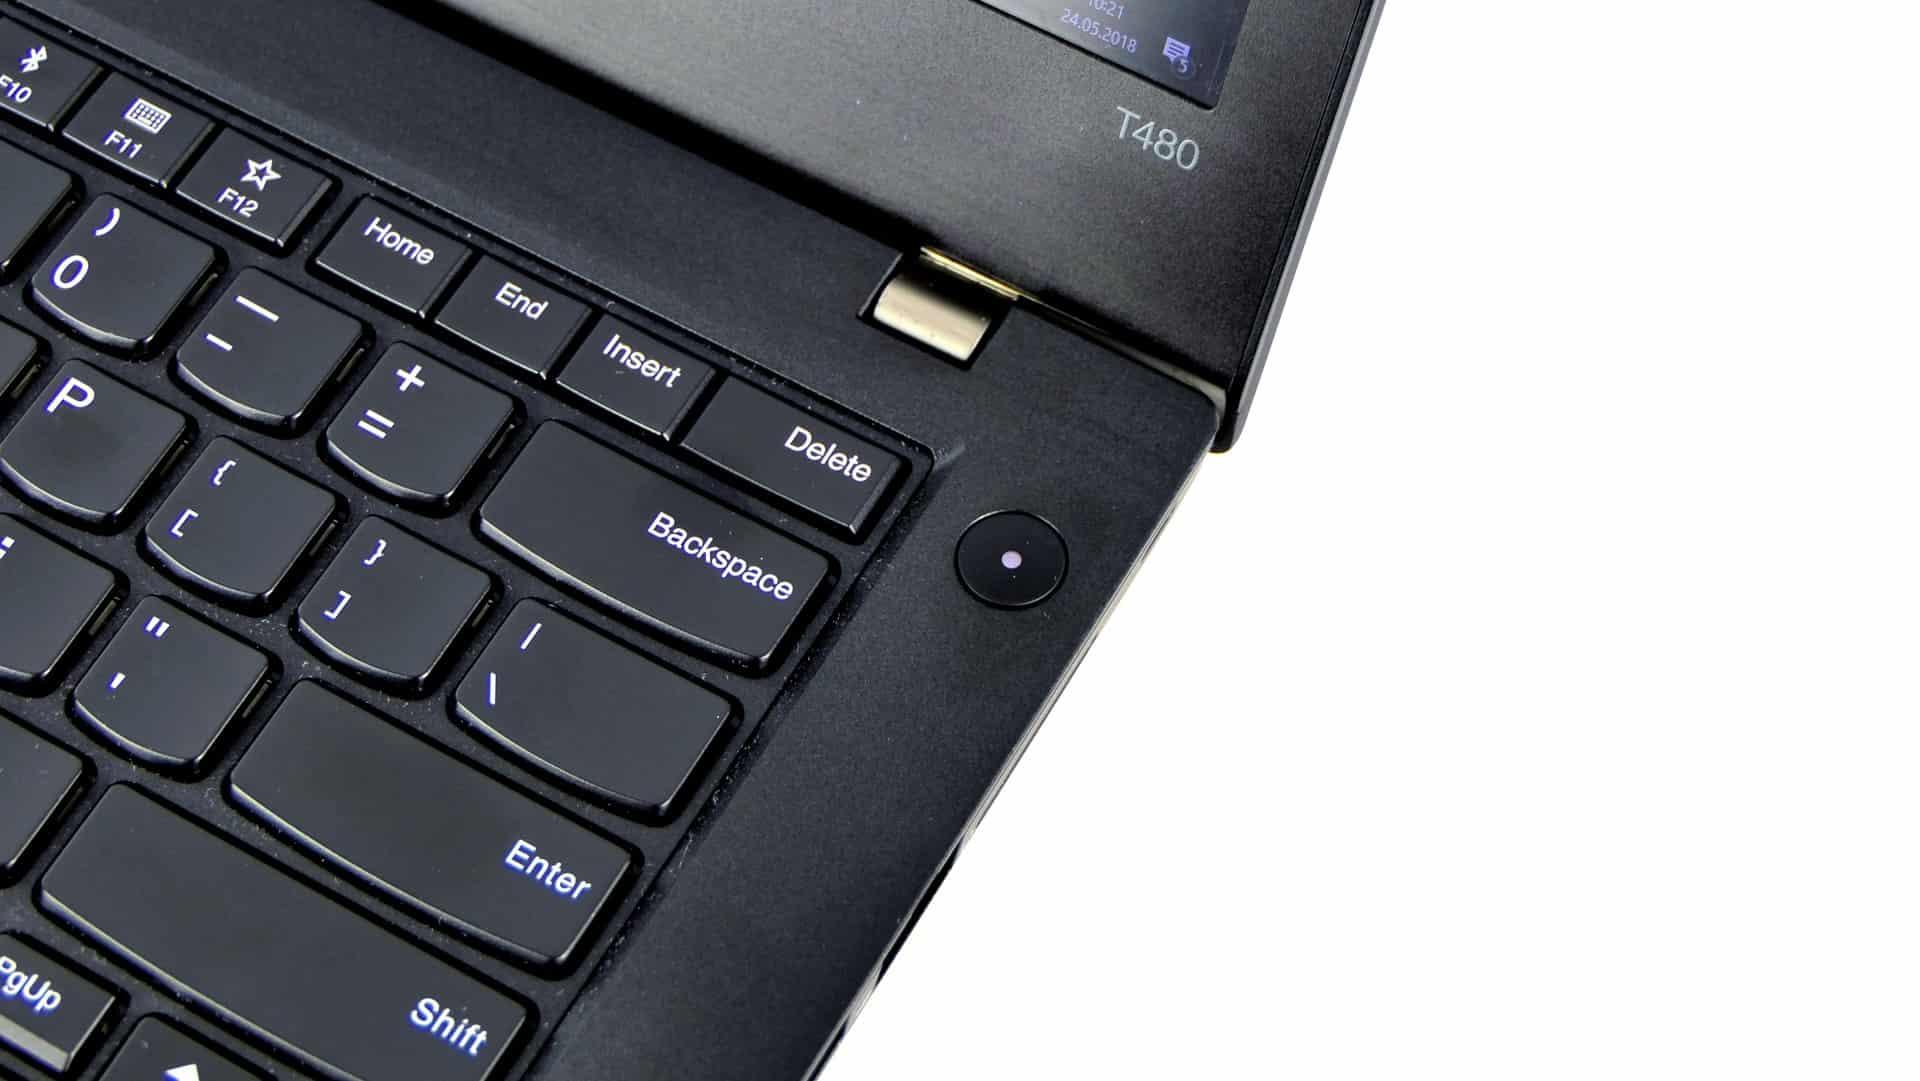 Lenovo ThinkPad T480 - prawa strona pulpitu